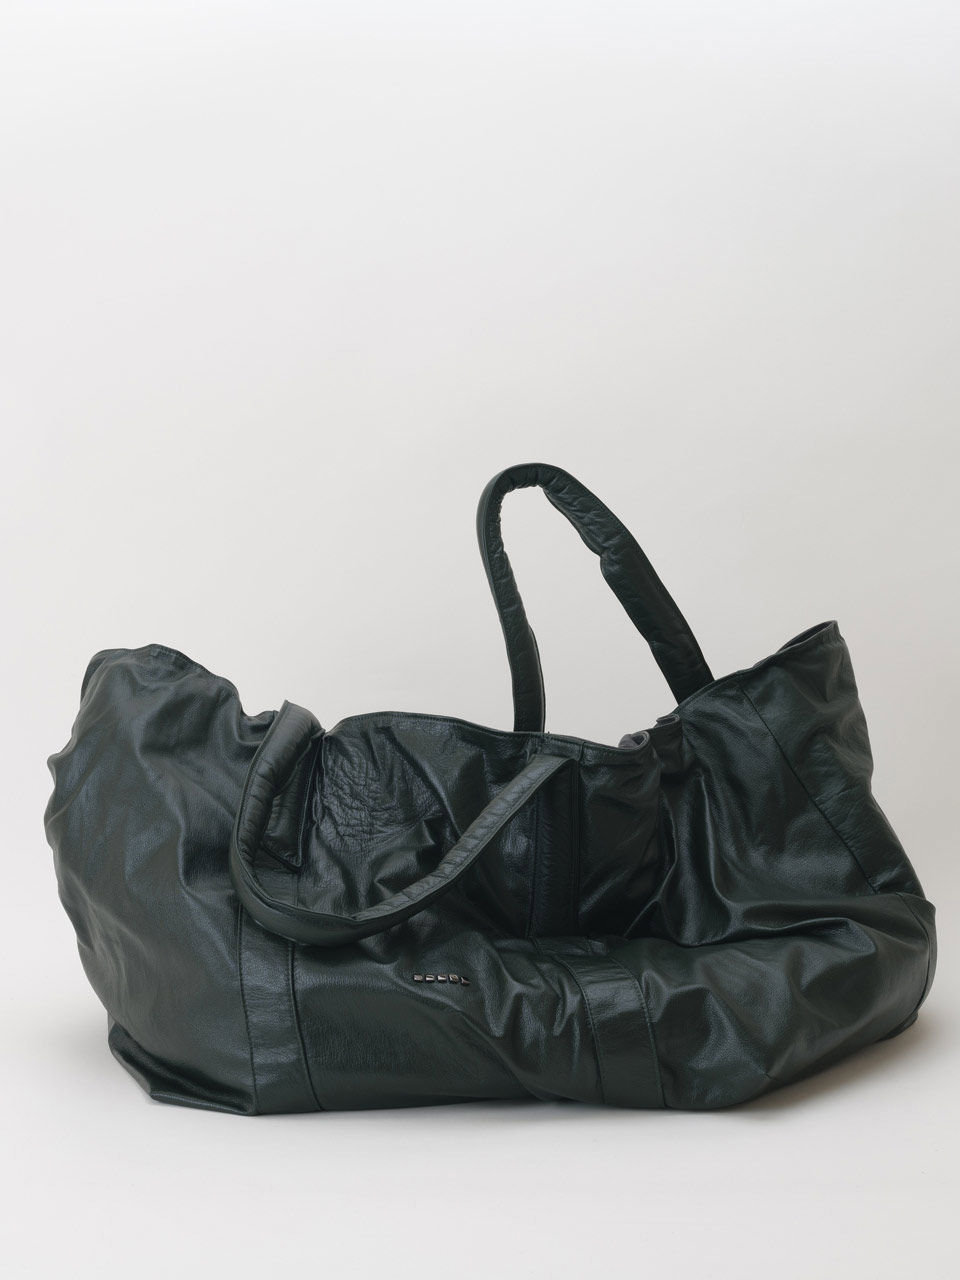 duren cuir maroquinerie hiver 2020 sac